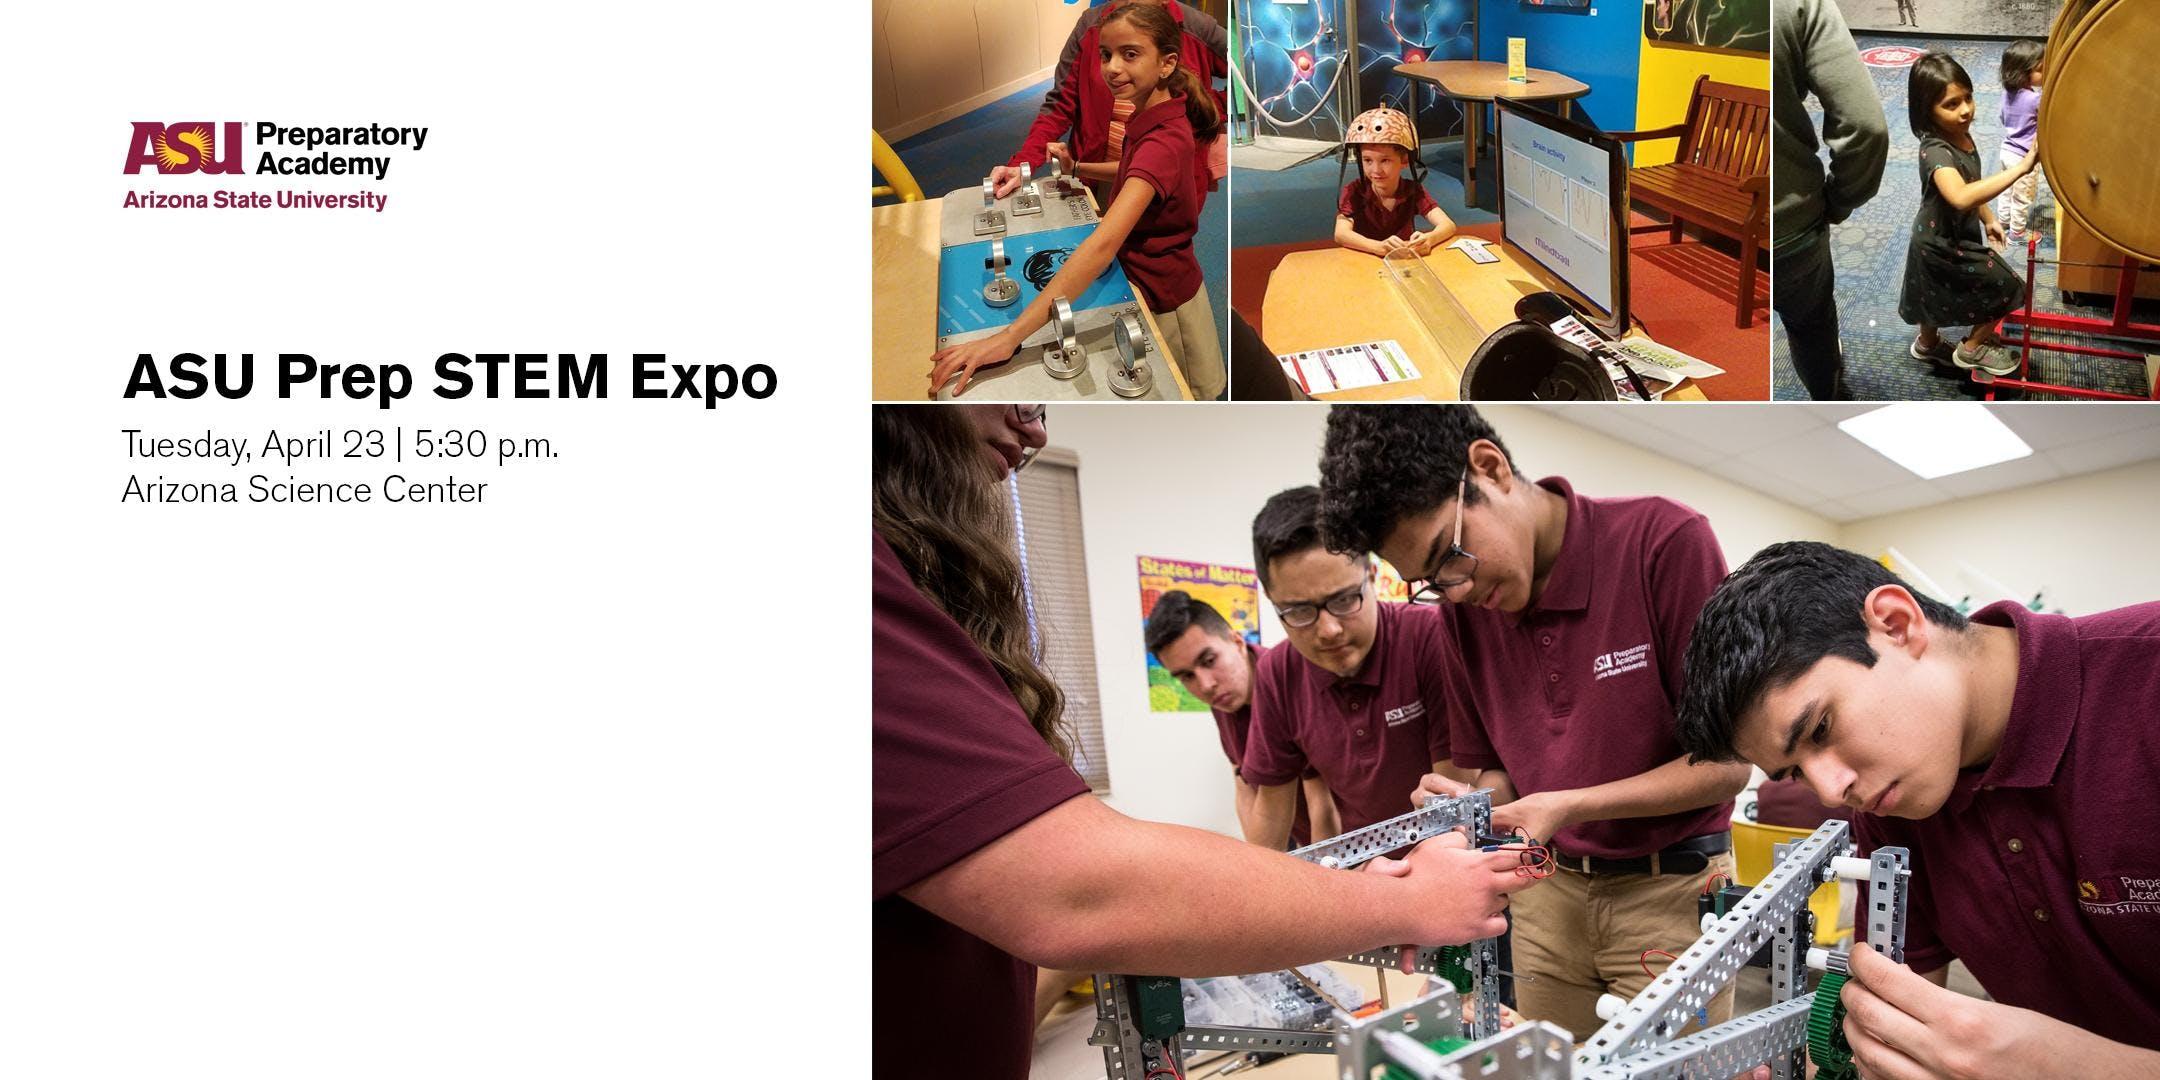 ASU Prep STEM Expo at the Arizona Science Center